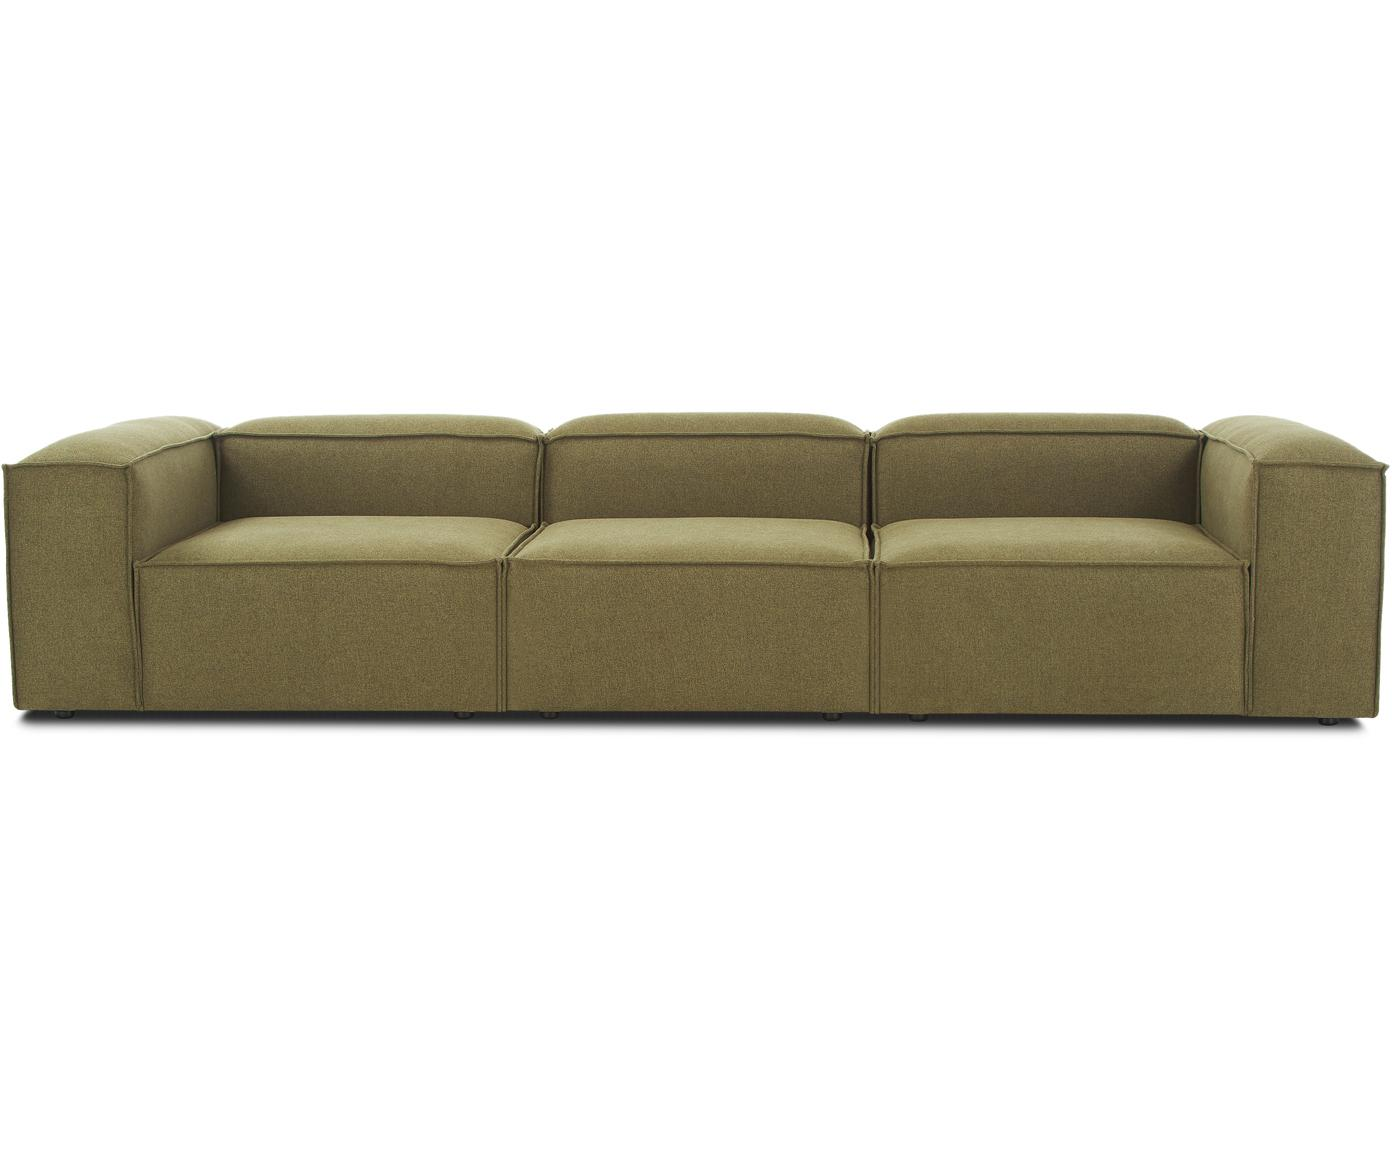 Modulares Sofa Lennon (4-Sitzer), Bezug: 100% Polyester 35.000 Sch, Gestell: Massives Kiefernholz, Spe, Füße: Kunststoff, Webstoff Grün, B 326 x T 119 cm